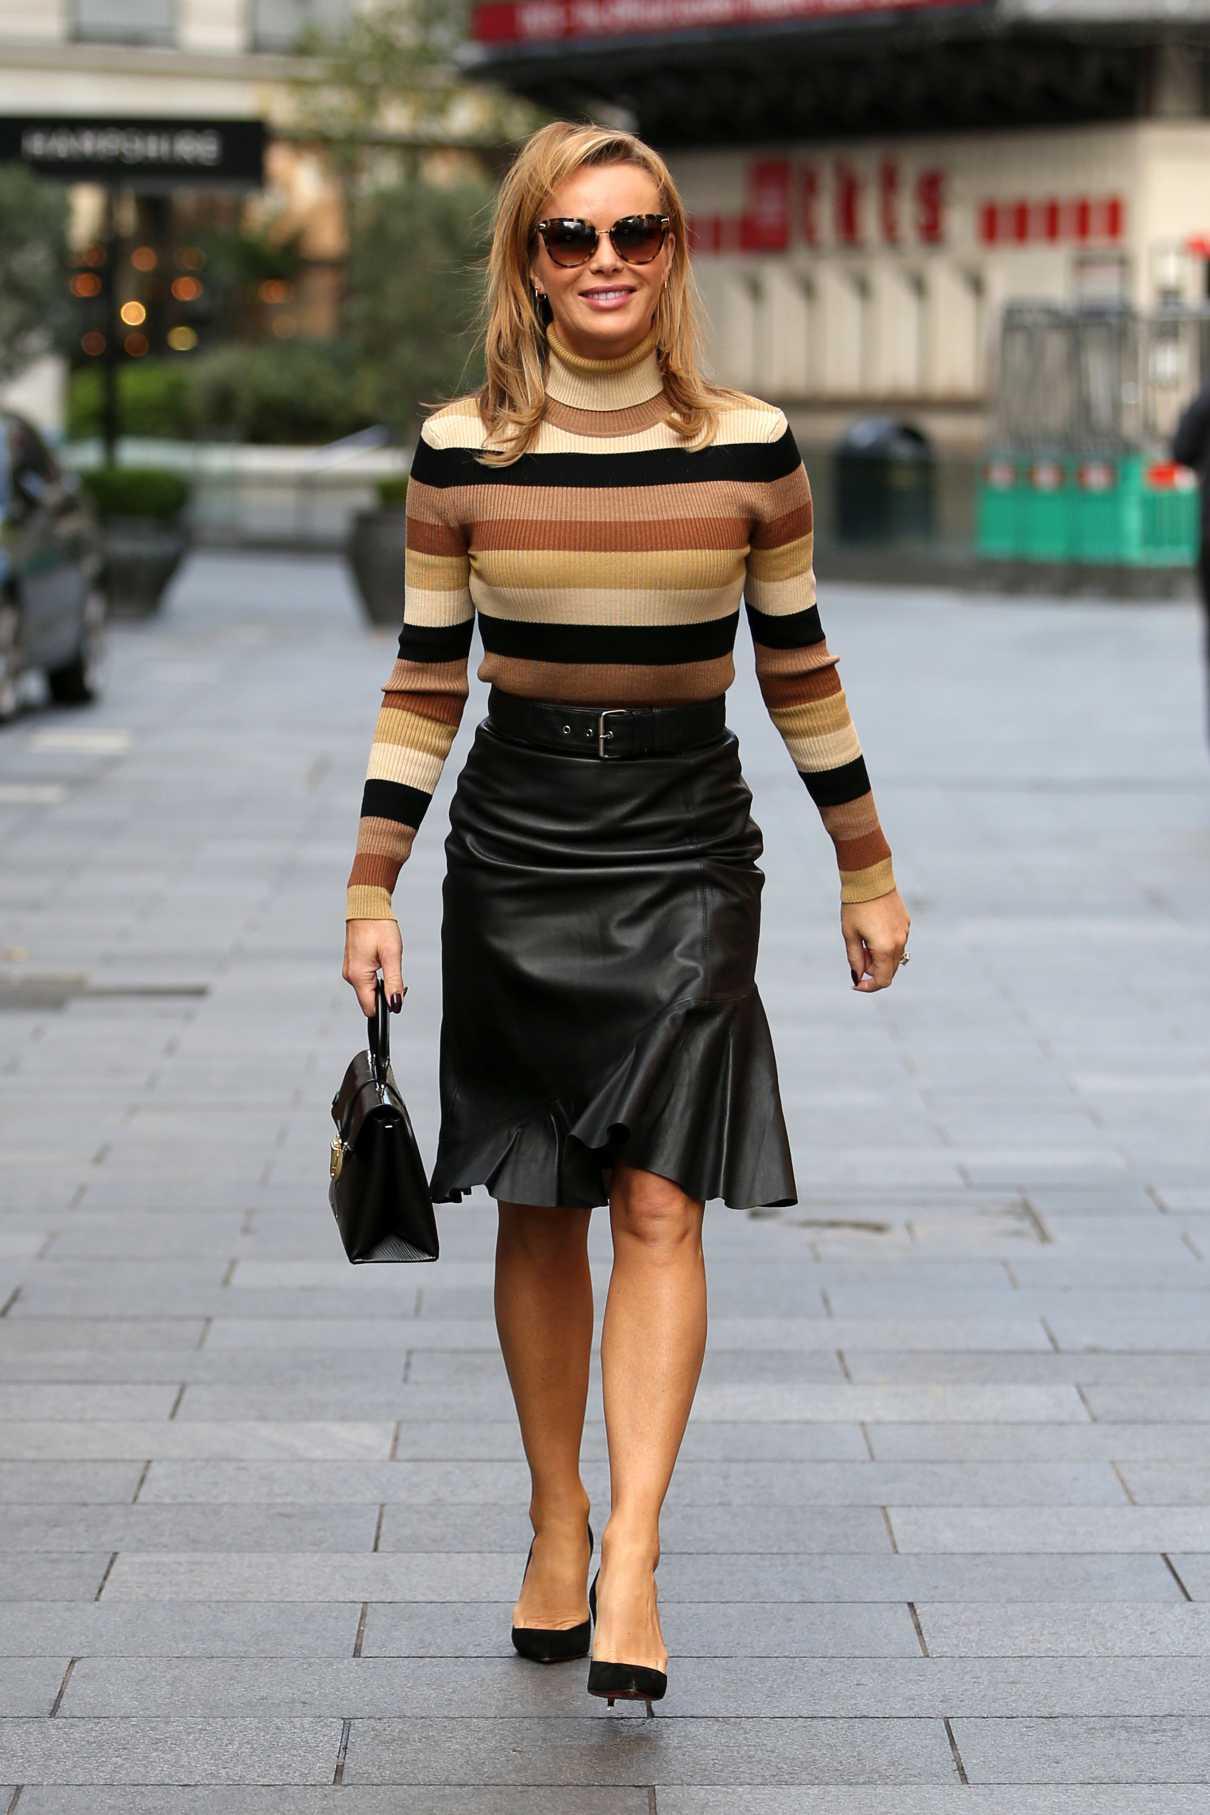 Amanda Holden in a Black Leather Skirt